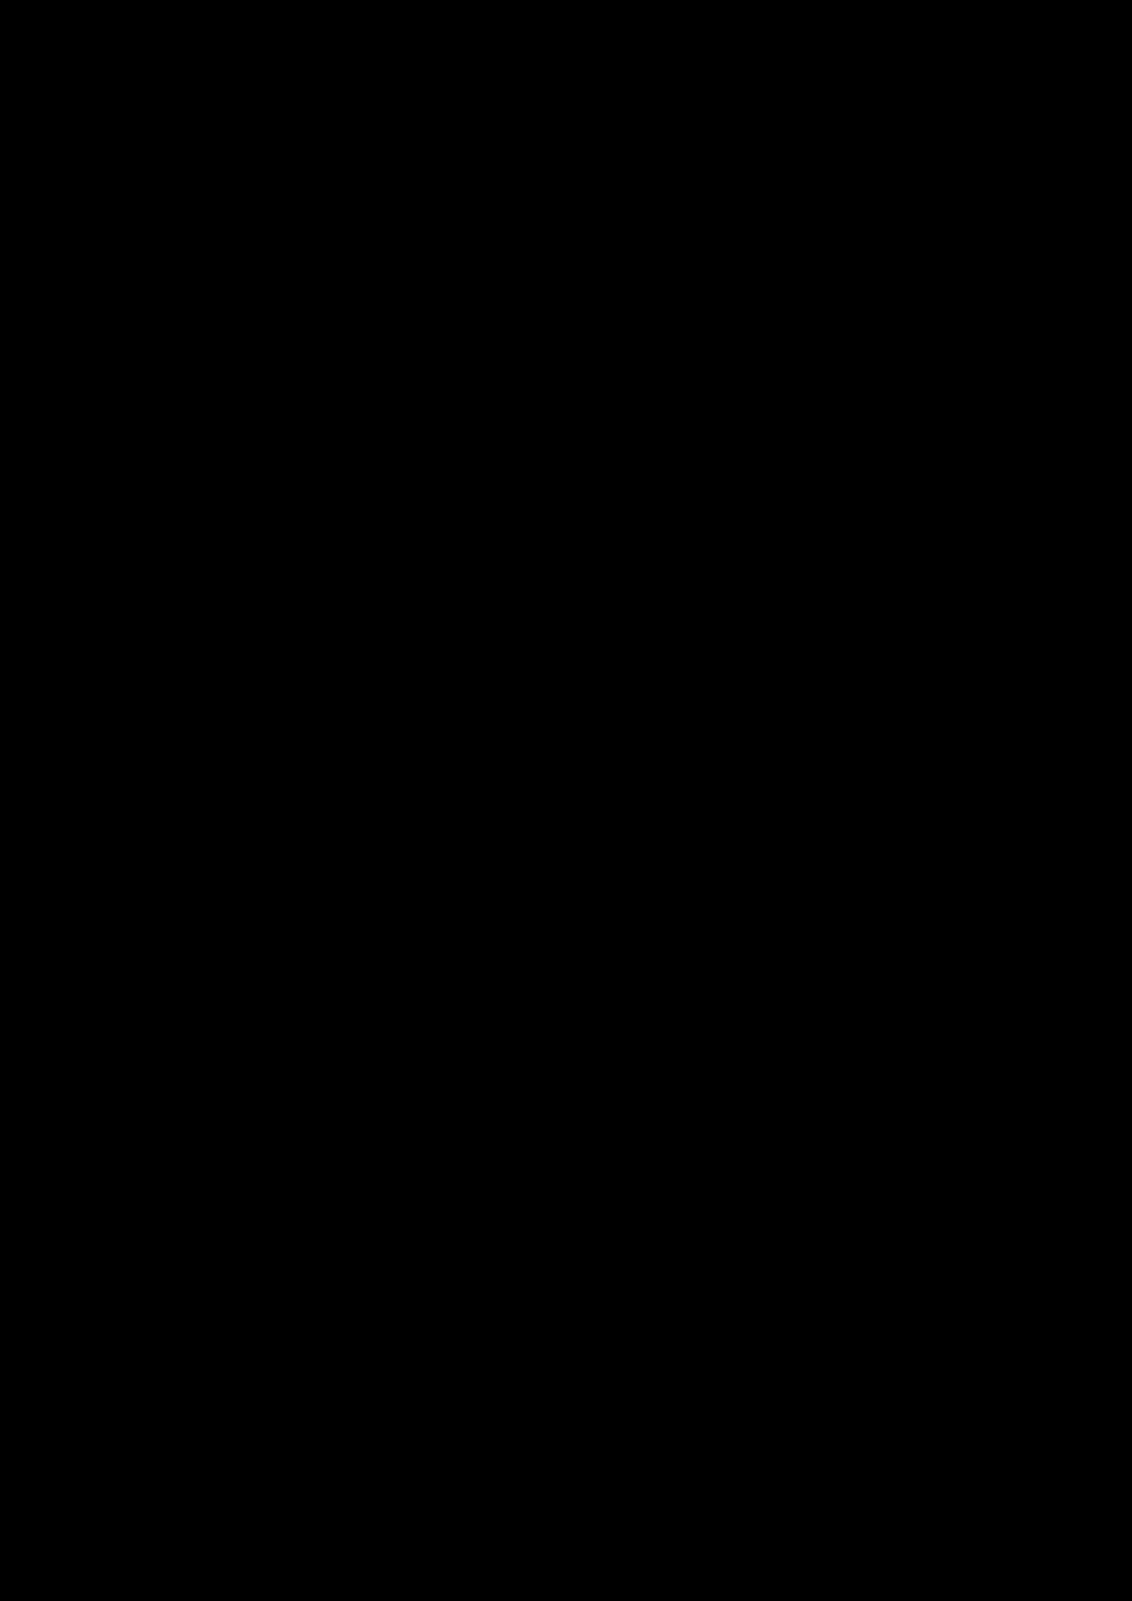 Belyiy sokol slide, Image 115